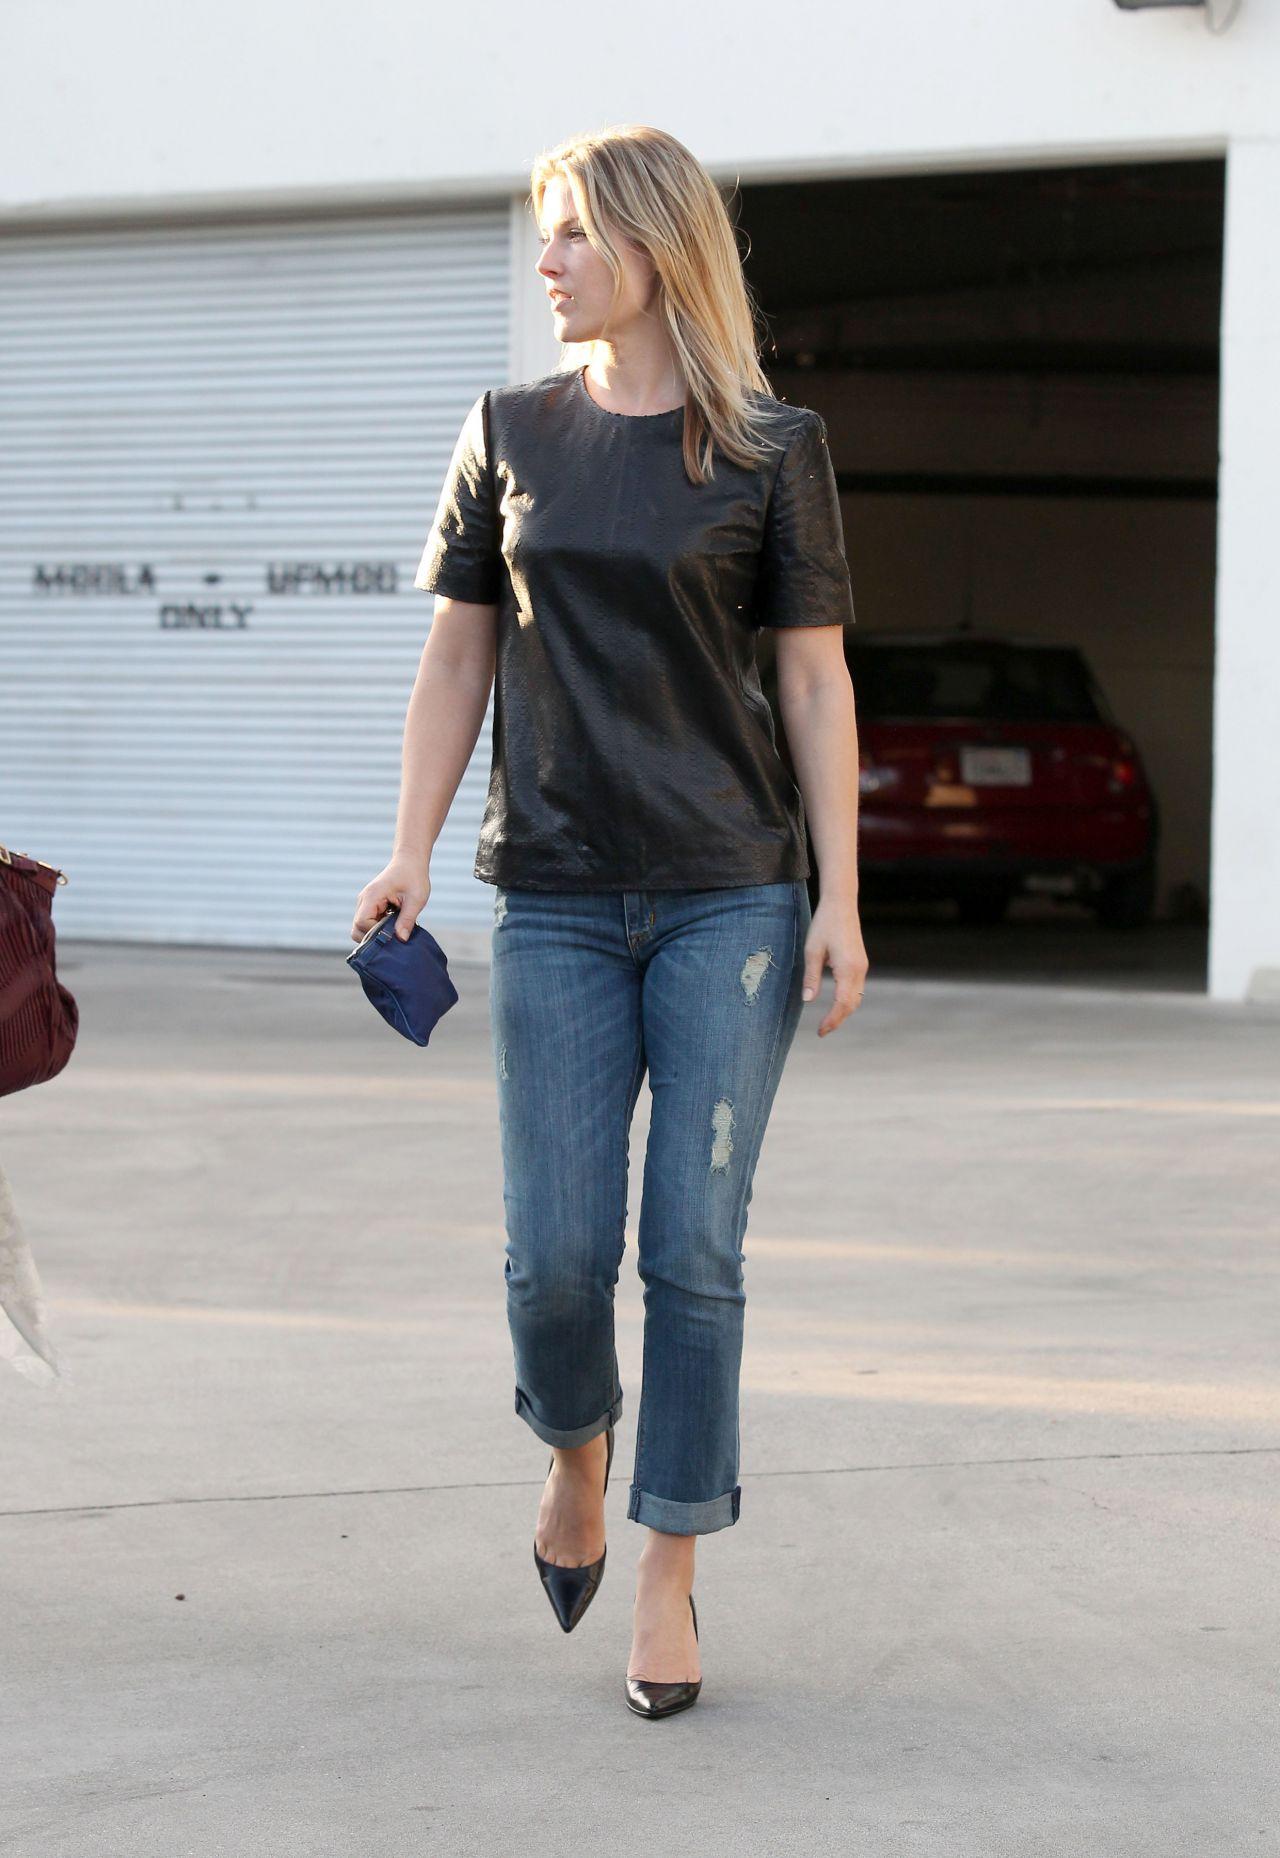 Ali Larter In Jeans Out In La May 2014